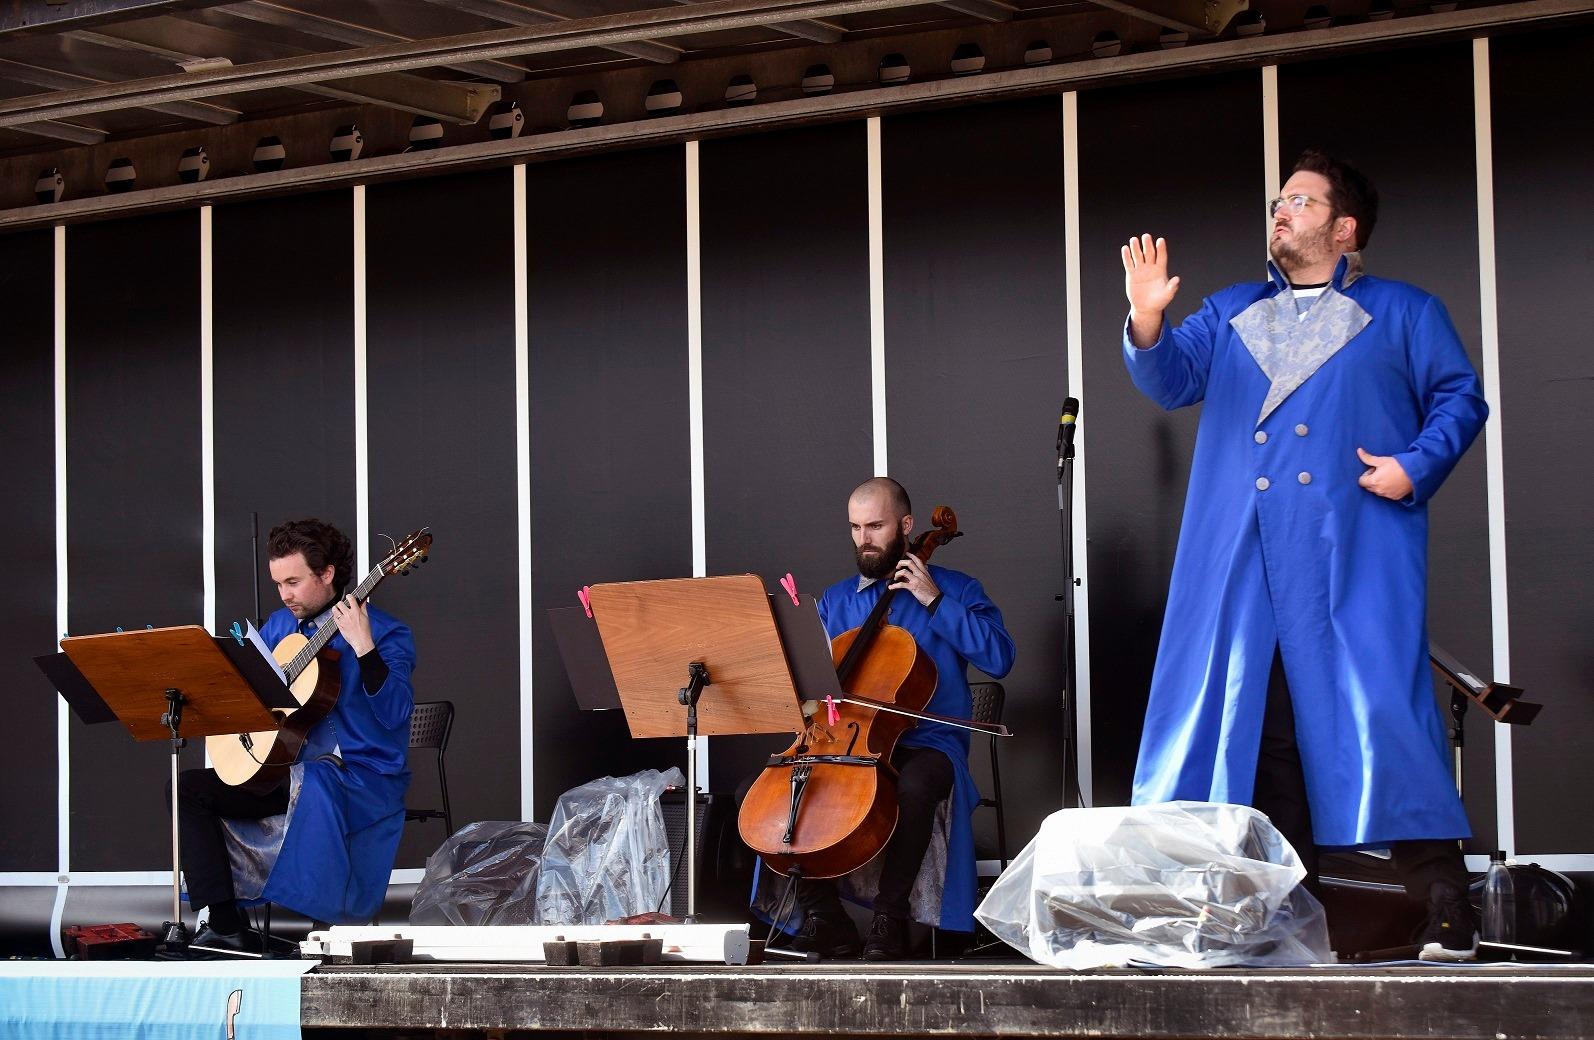 Scottish Opera is doing nightly pop-ups